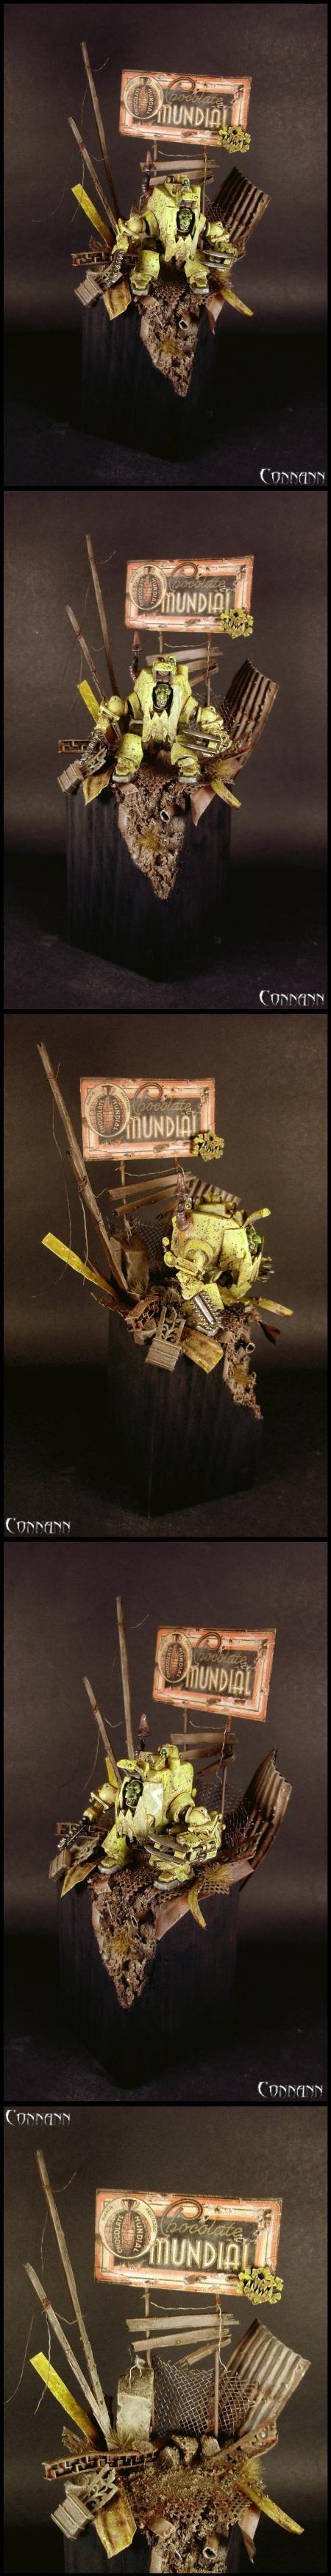 AT-43, Bad Moons, Diorama, Gretchin, Orks, Terrain, W40k, Warhammer 40,000